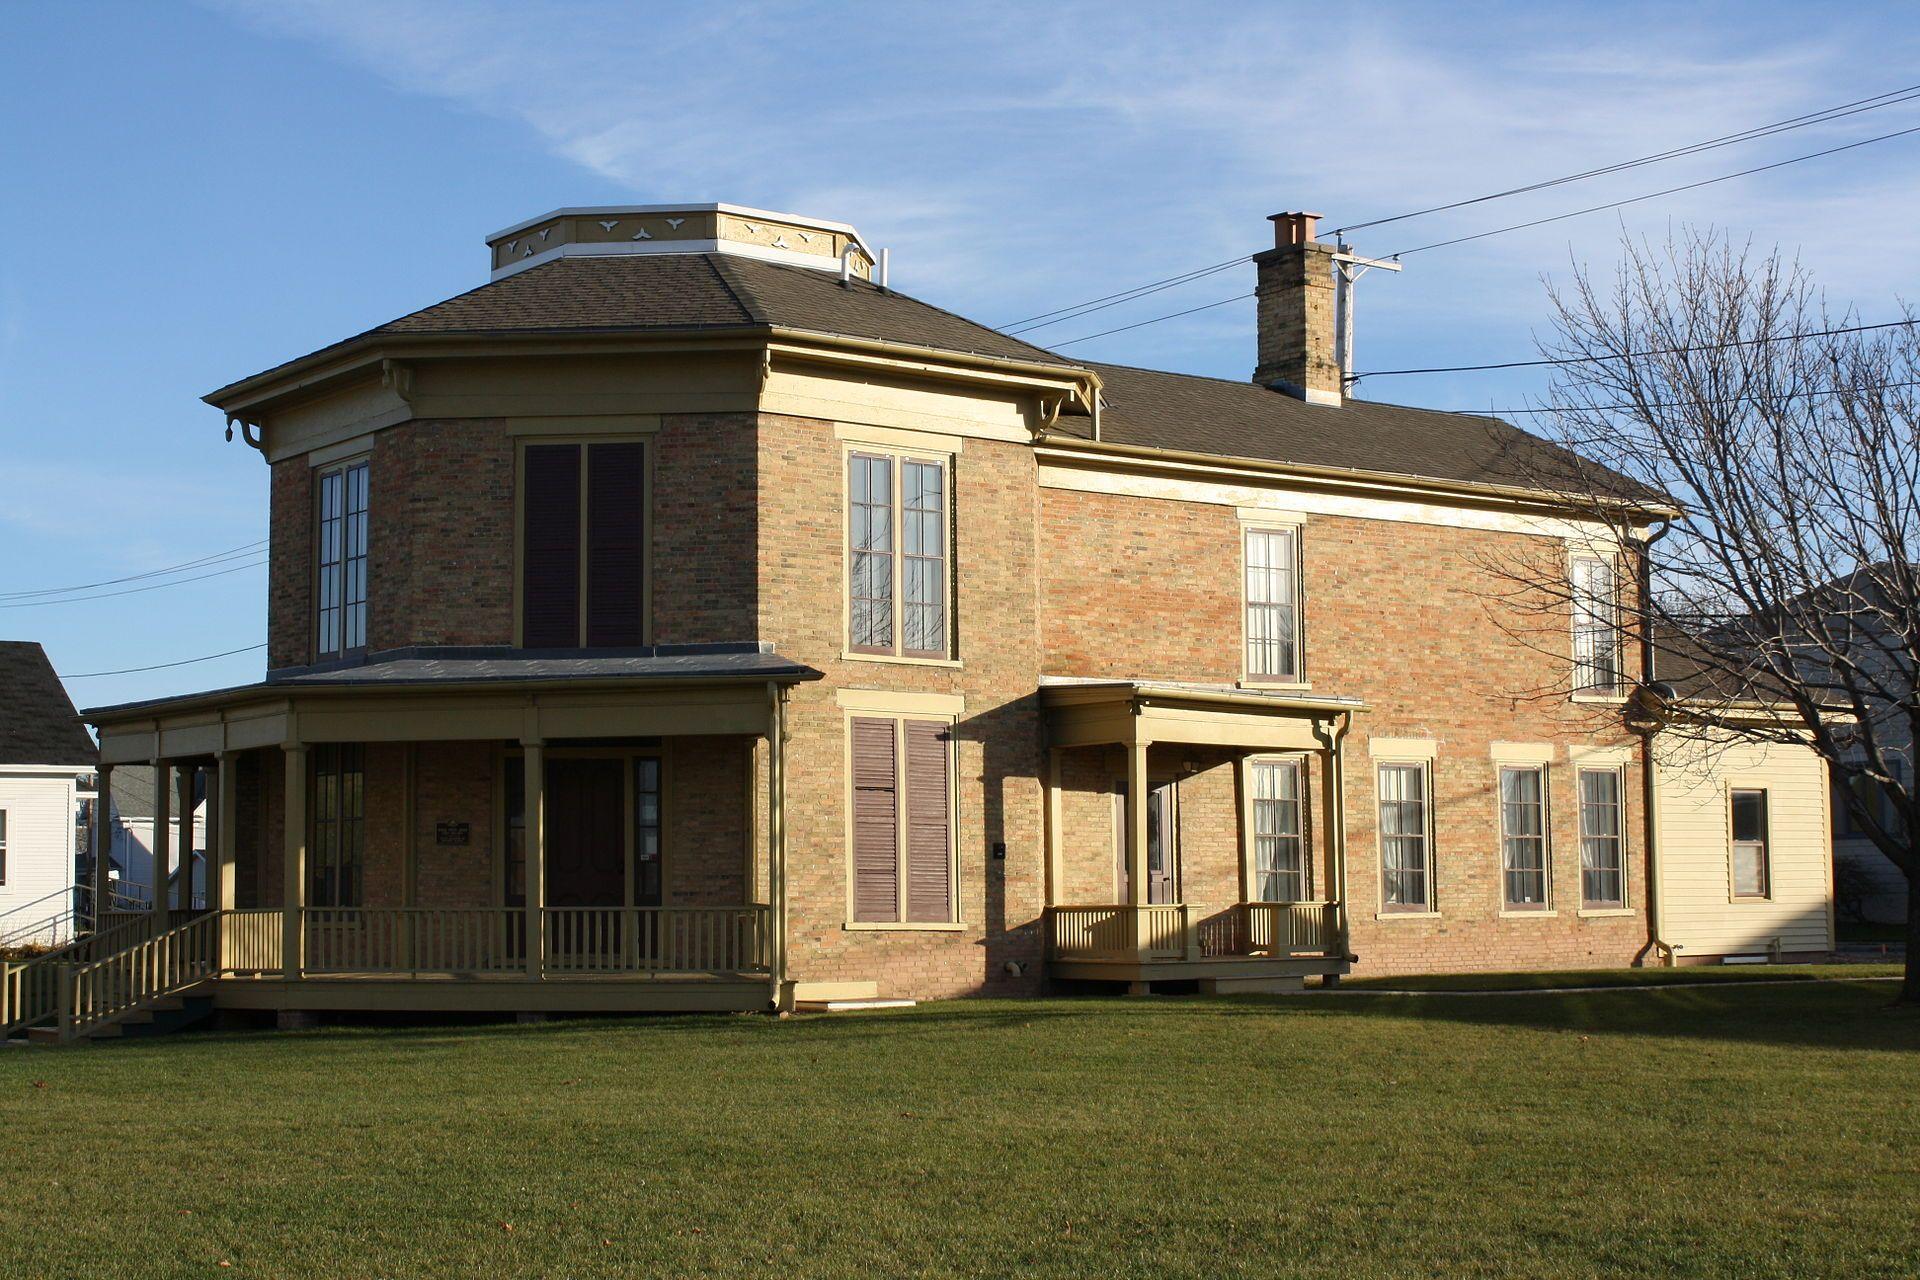 Hiram smith house in winnebago county wisconsin